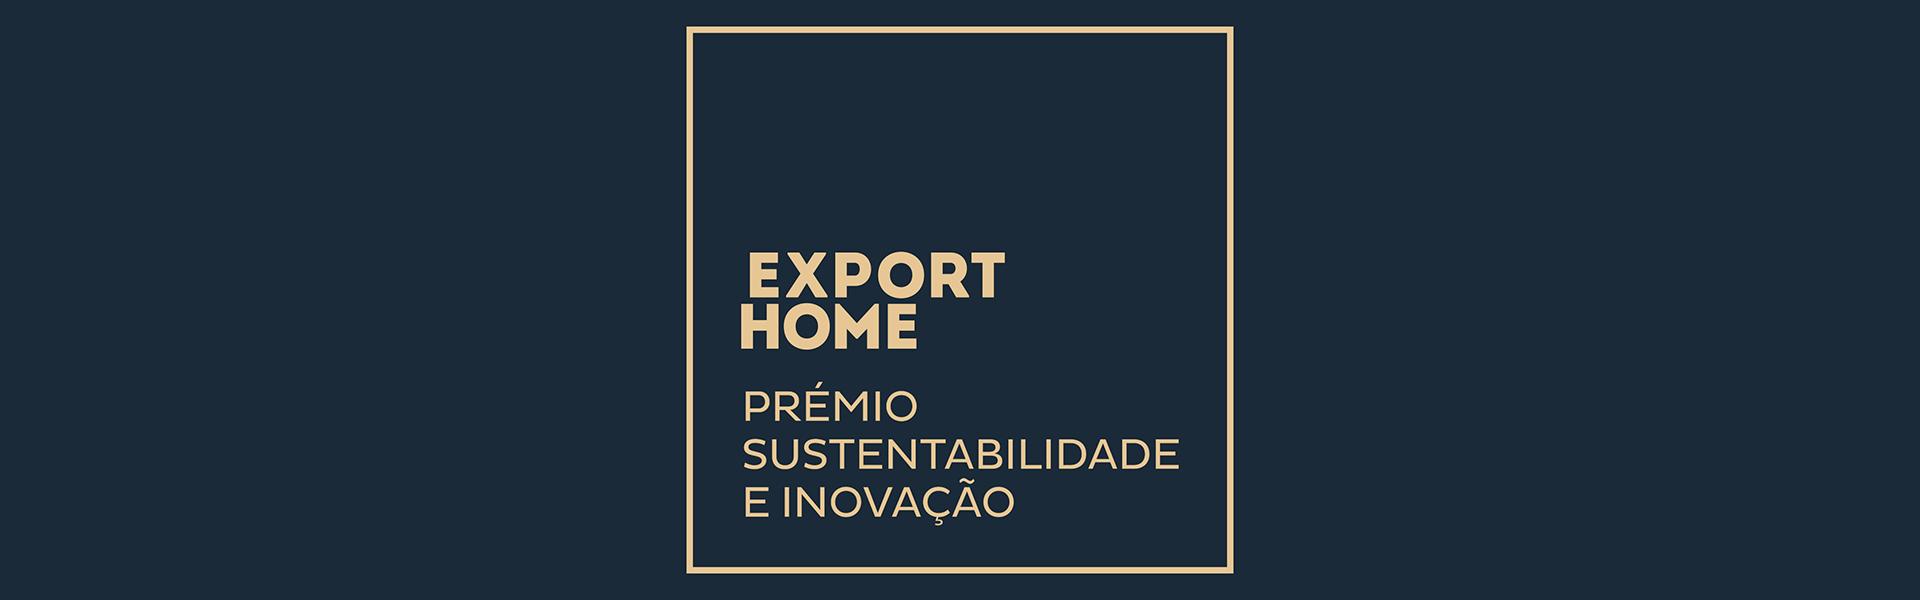 Prémios Export Home